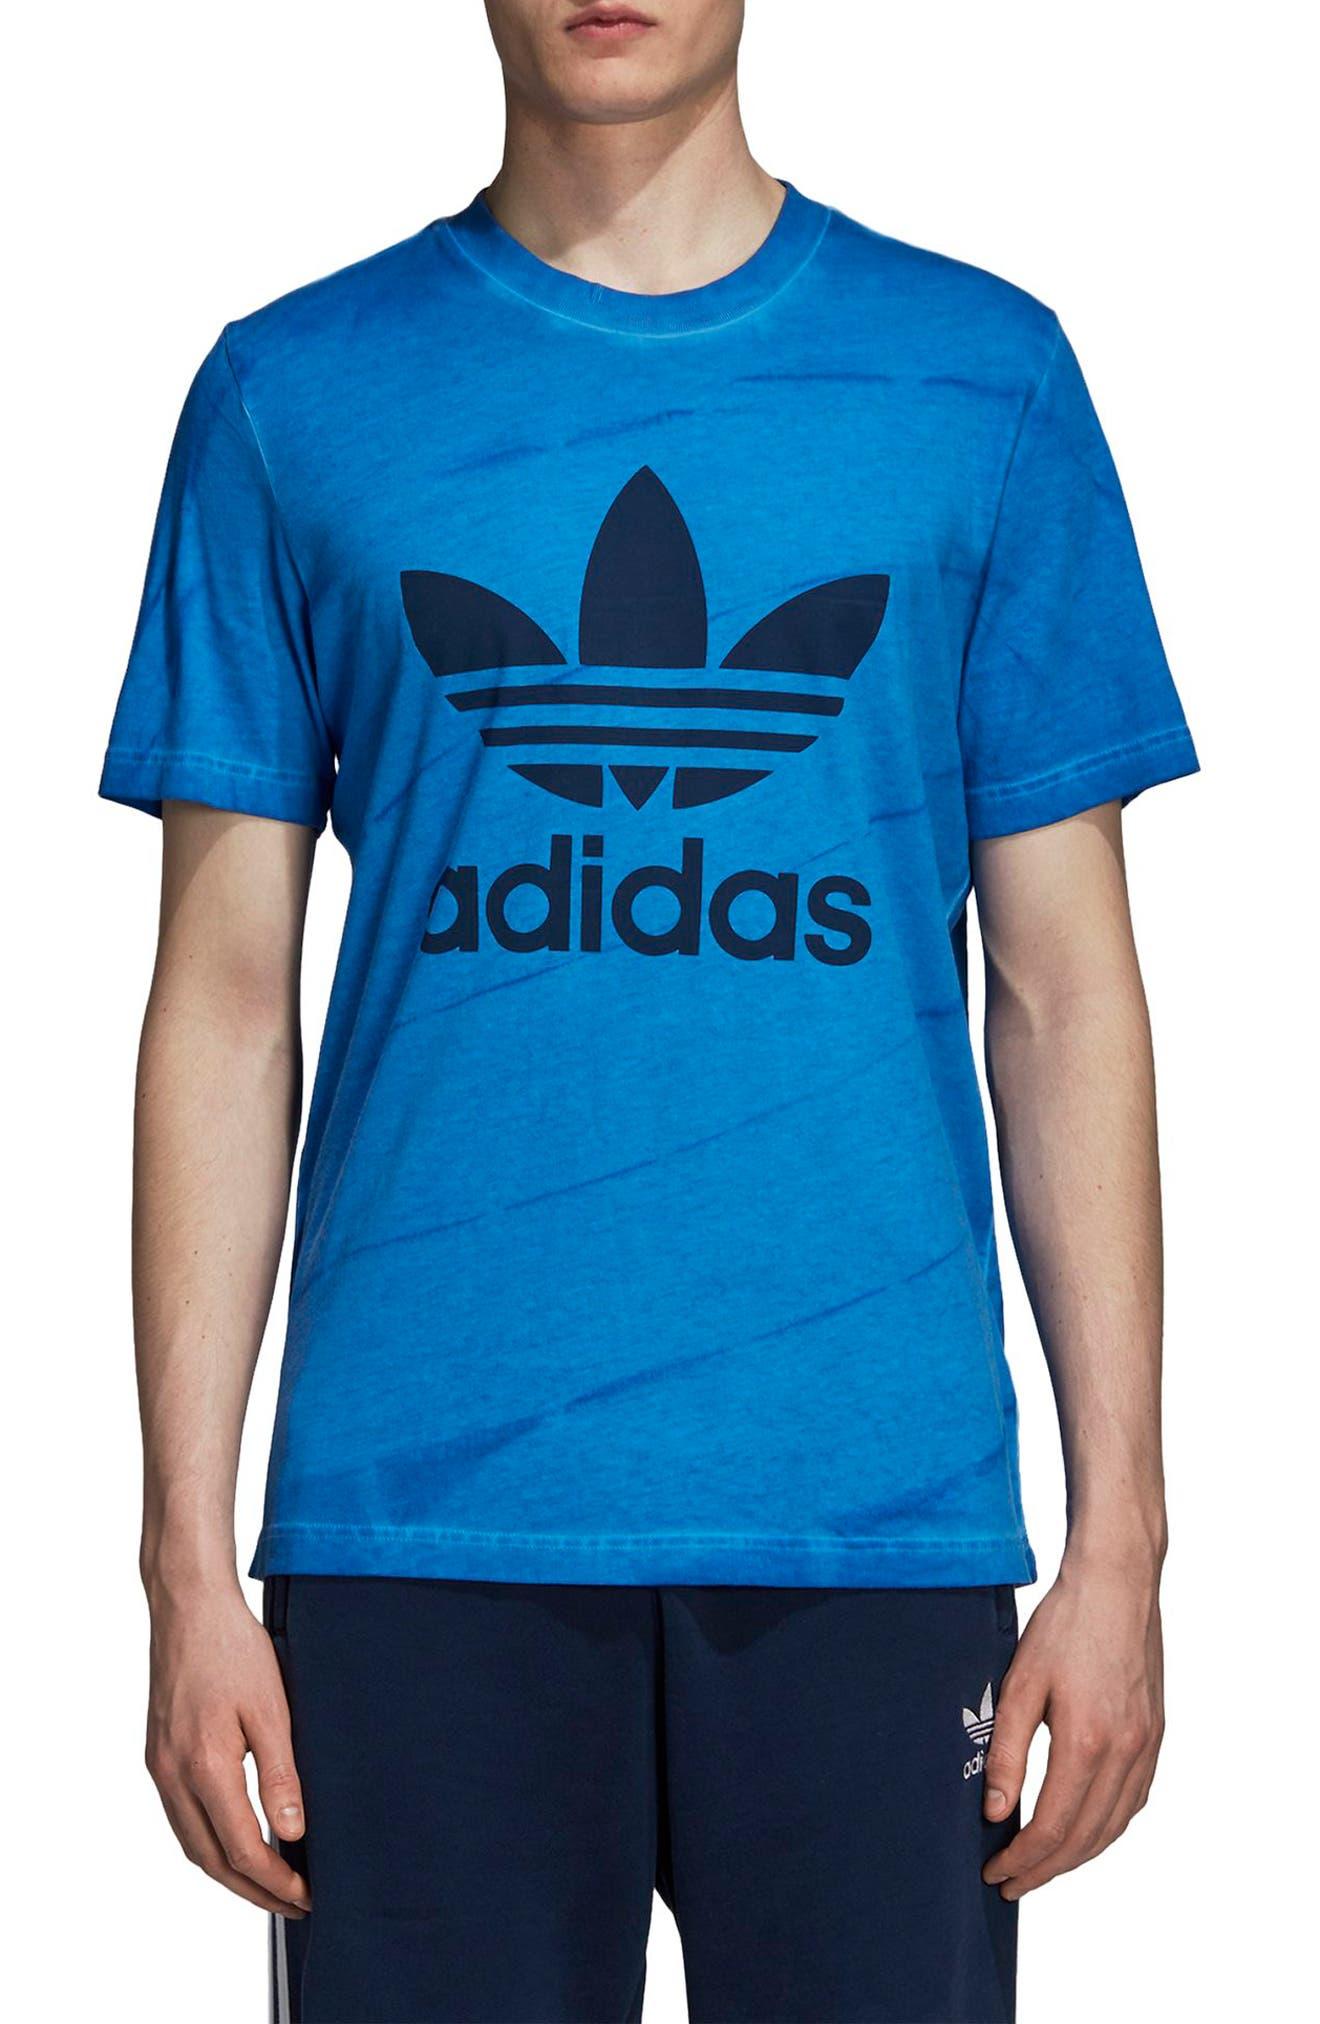 adidas Tie Dye T-Shirt,                             Main thumbnail 1, color,                             430